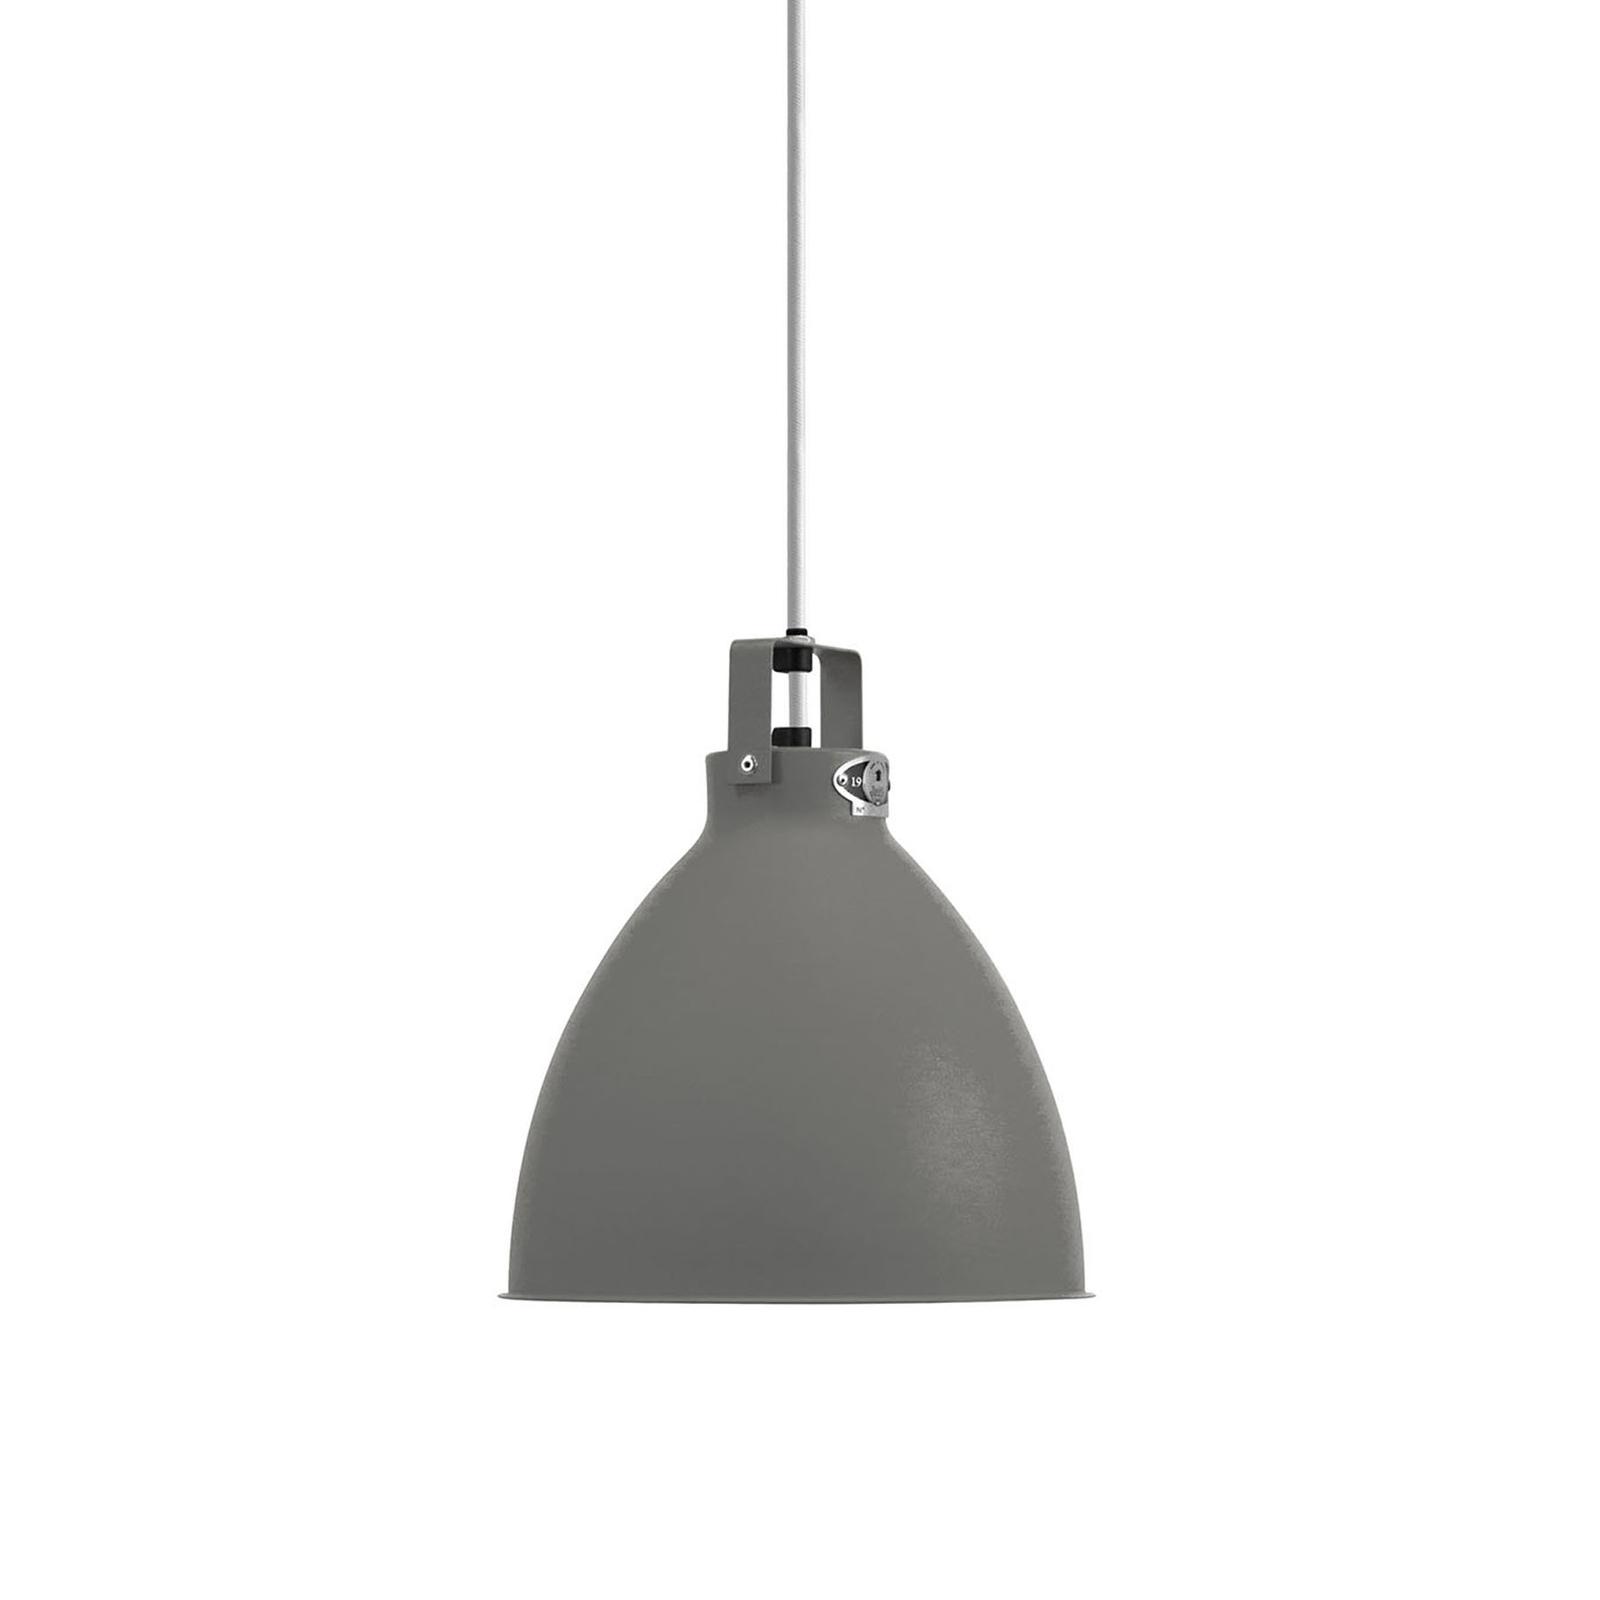 Jieldé Augustin A240 lampa wisząca szara matowa